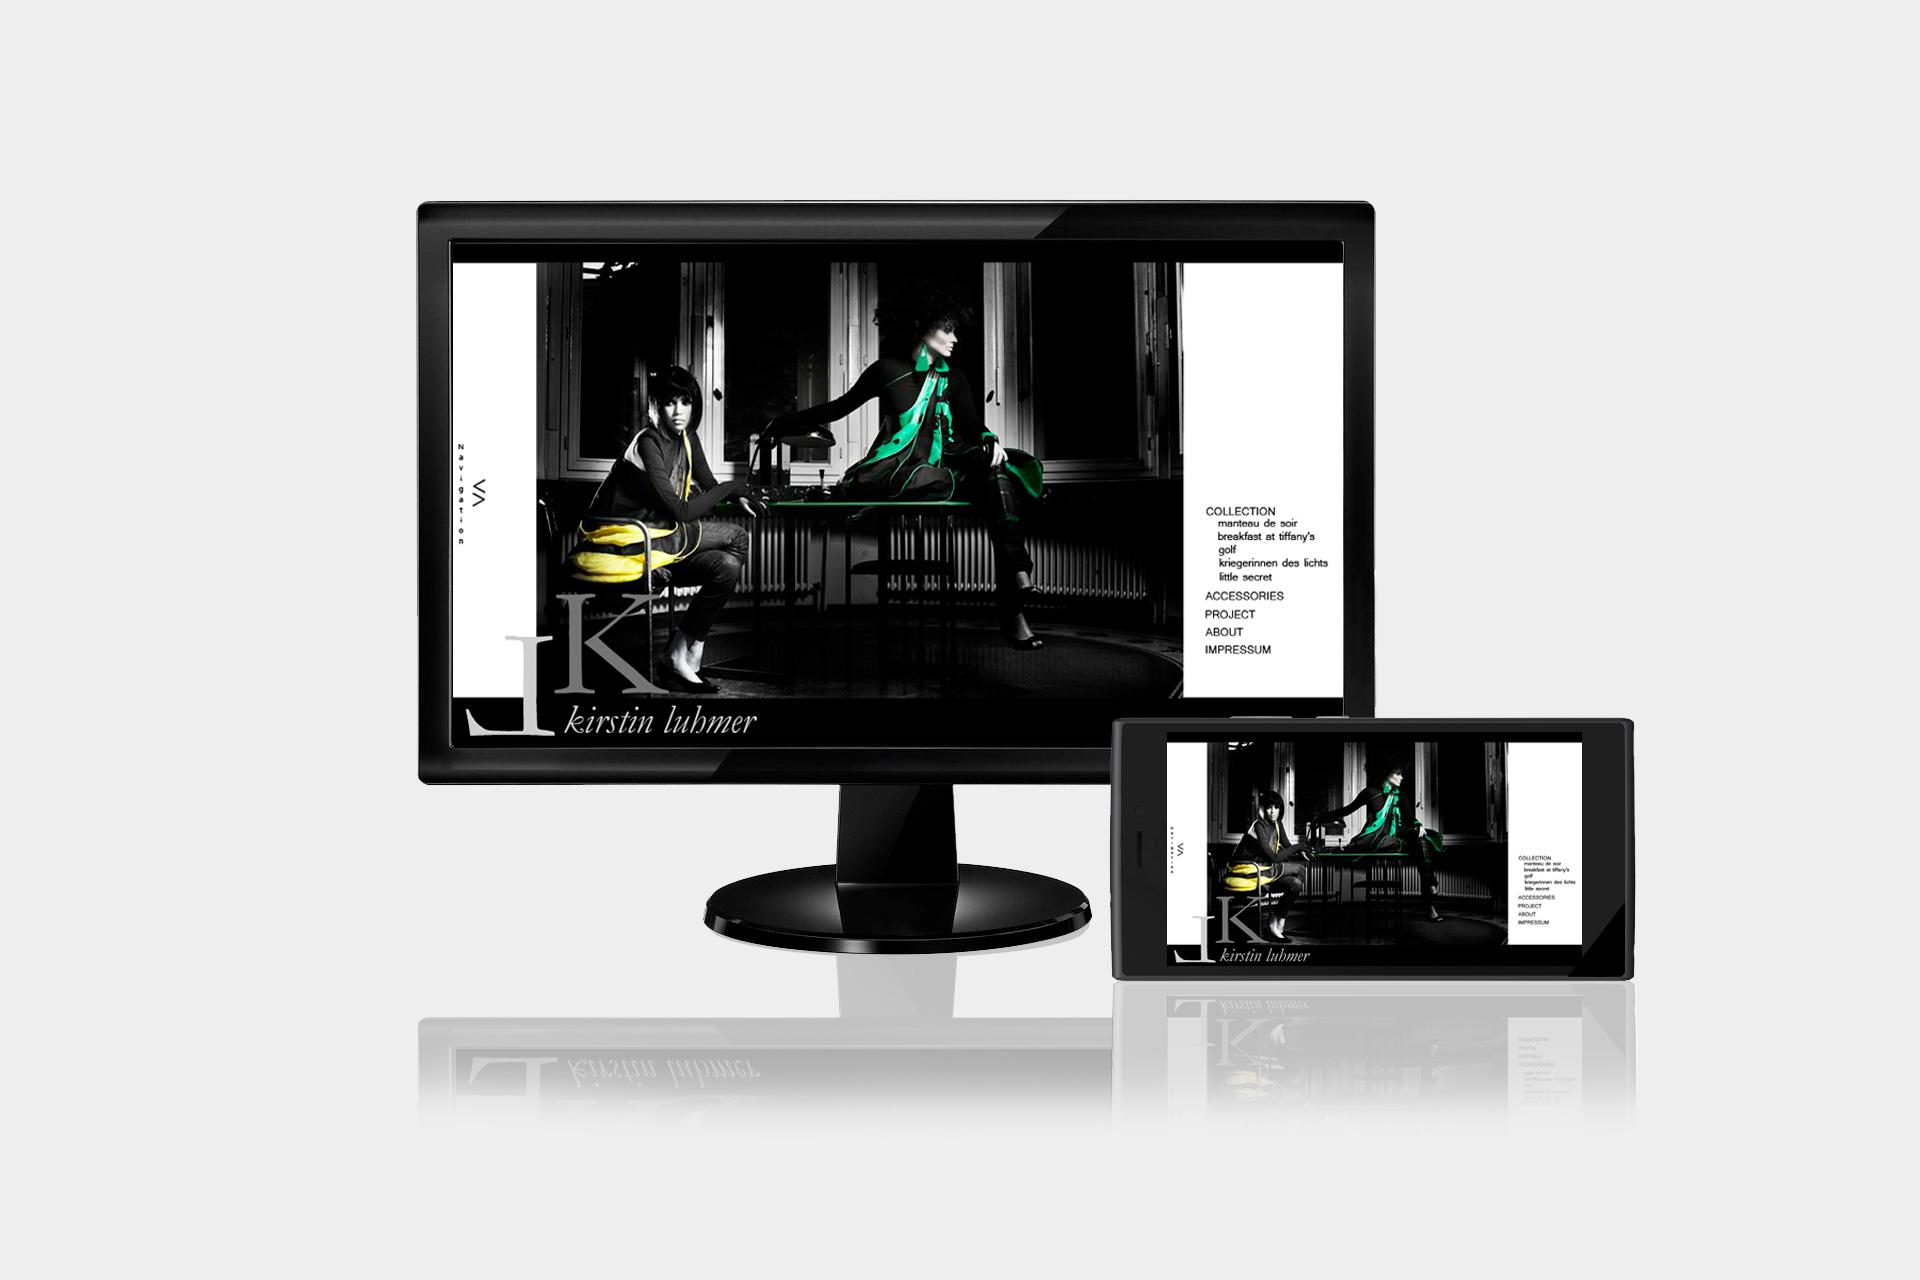 webdesign-luhmer-02